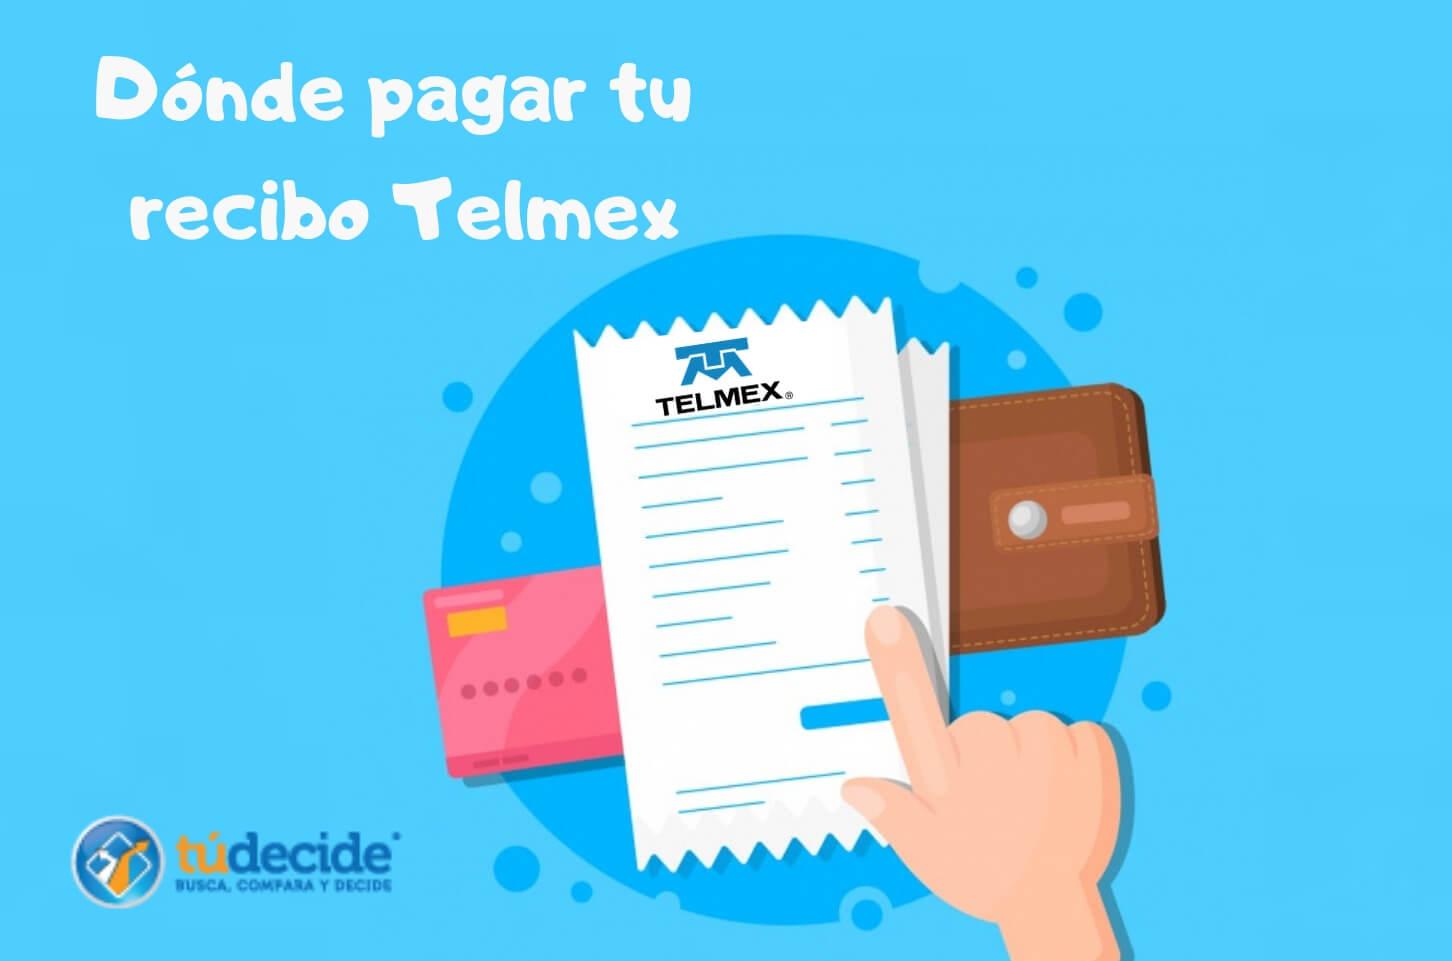 Dónde pagar Telmex